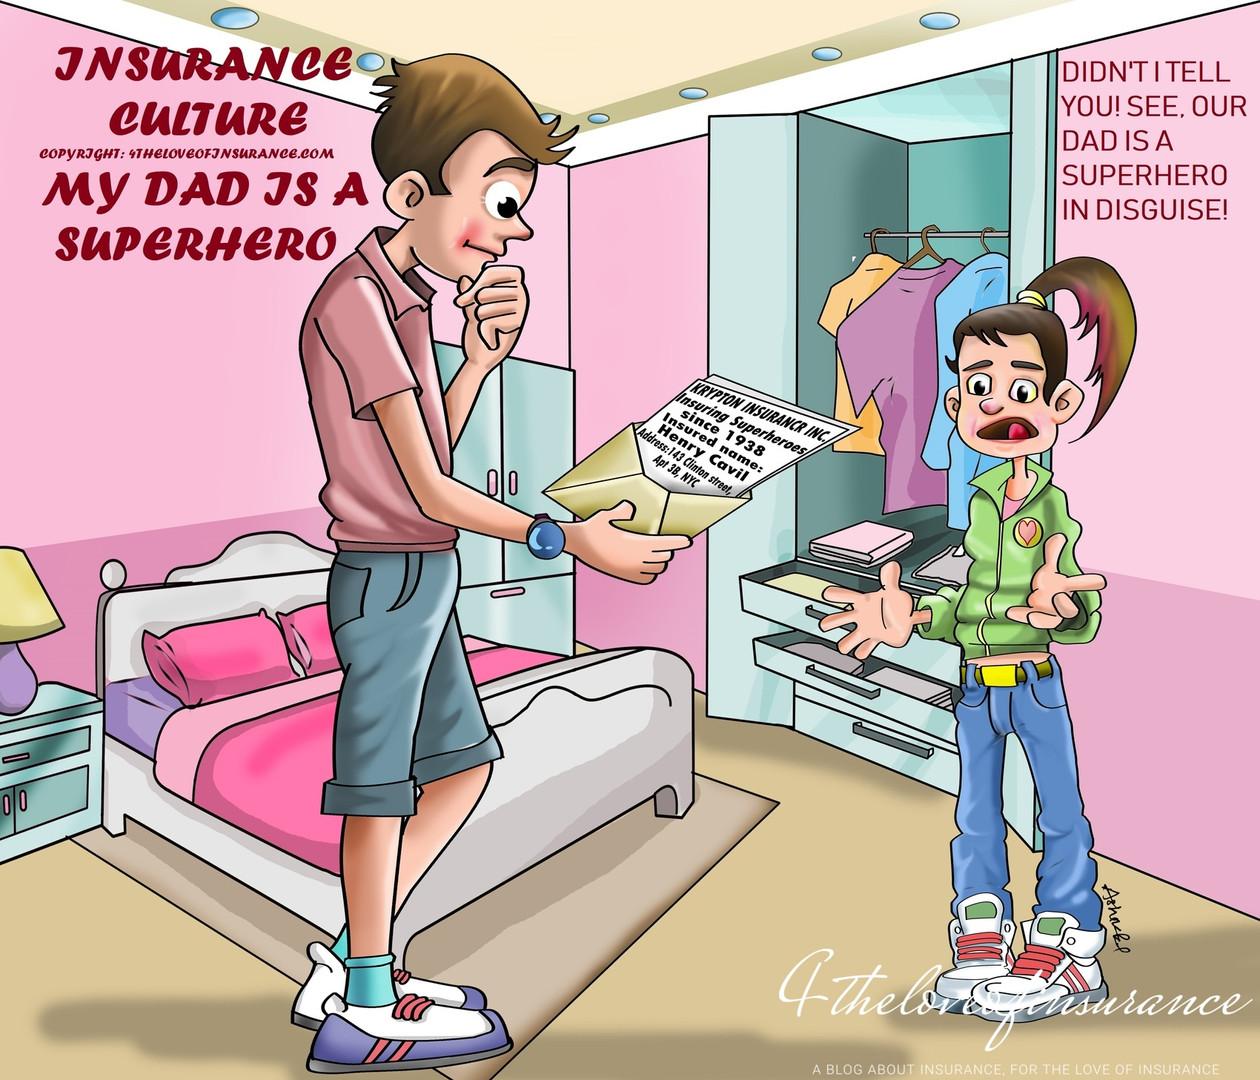 May Dad is a Superhero